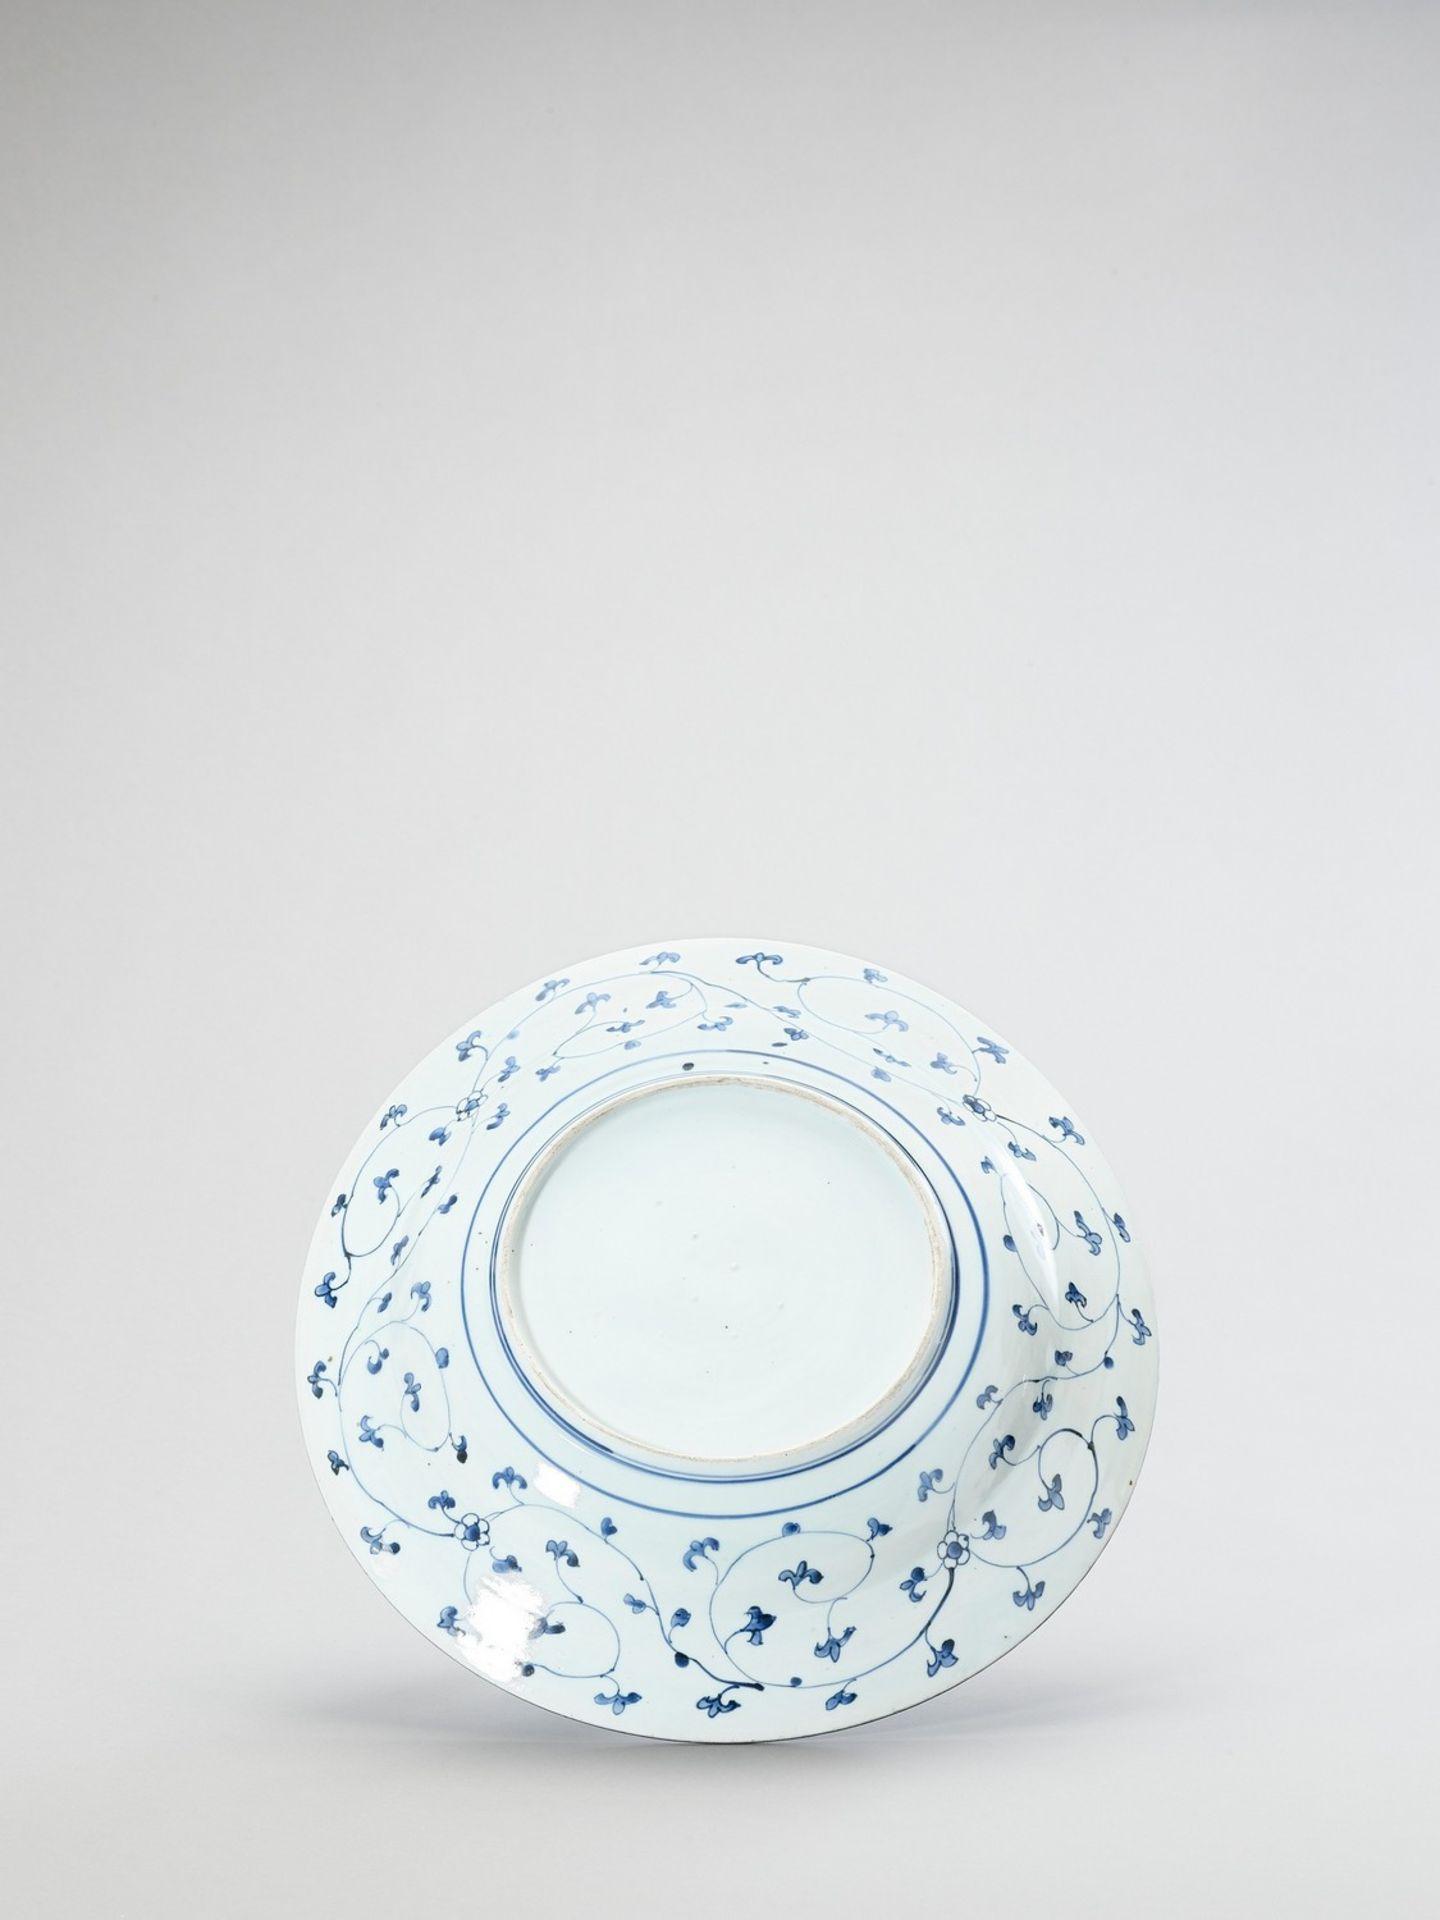 A LARGE BLUE AND WHITE PORCELAIN CHARGER - Bild 3 aus 5